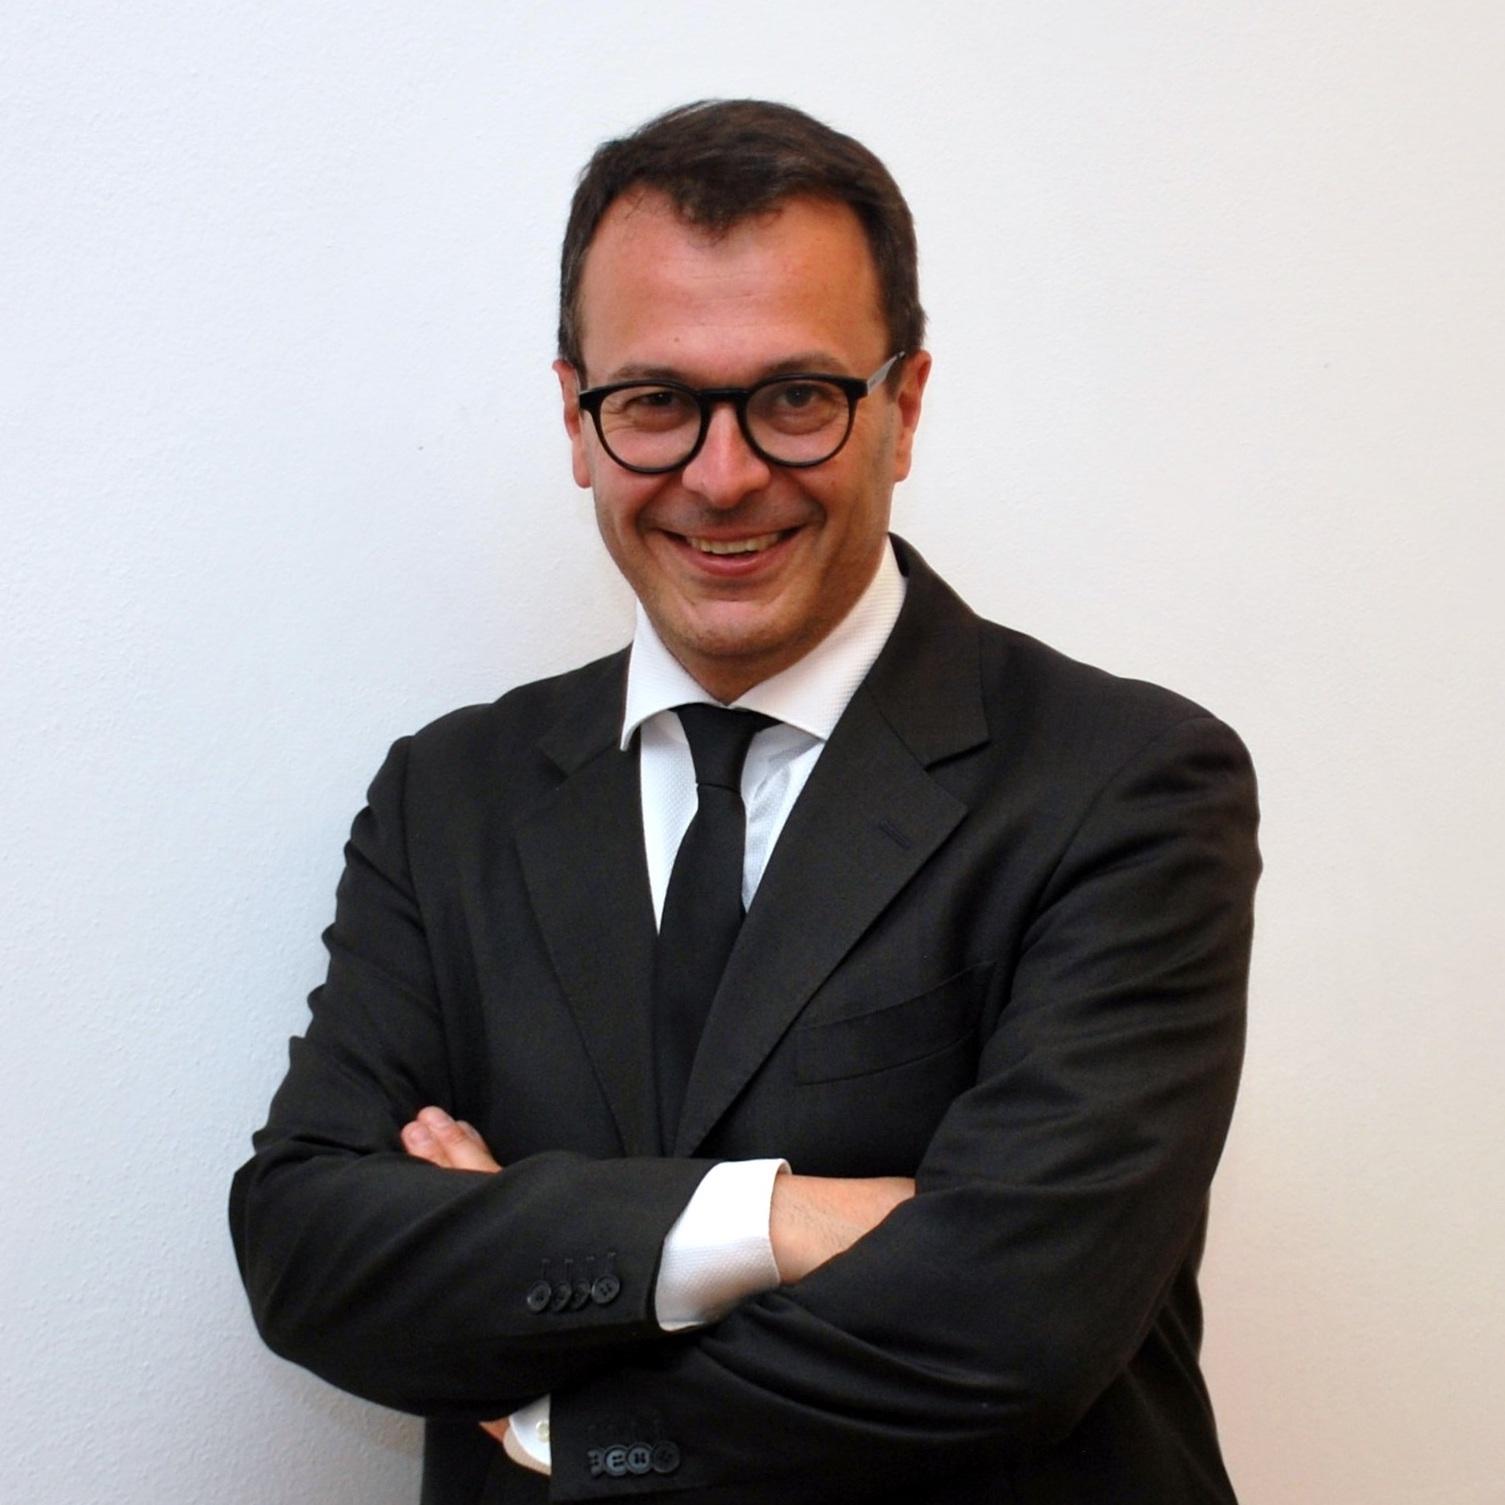 Giovanni Viganò